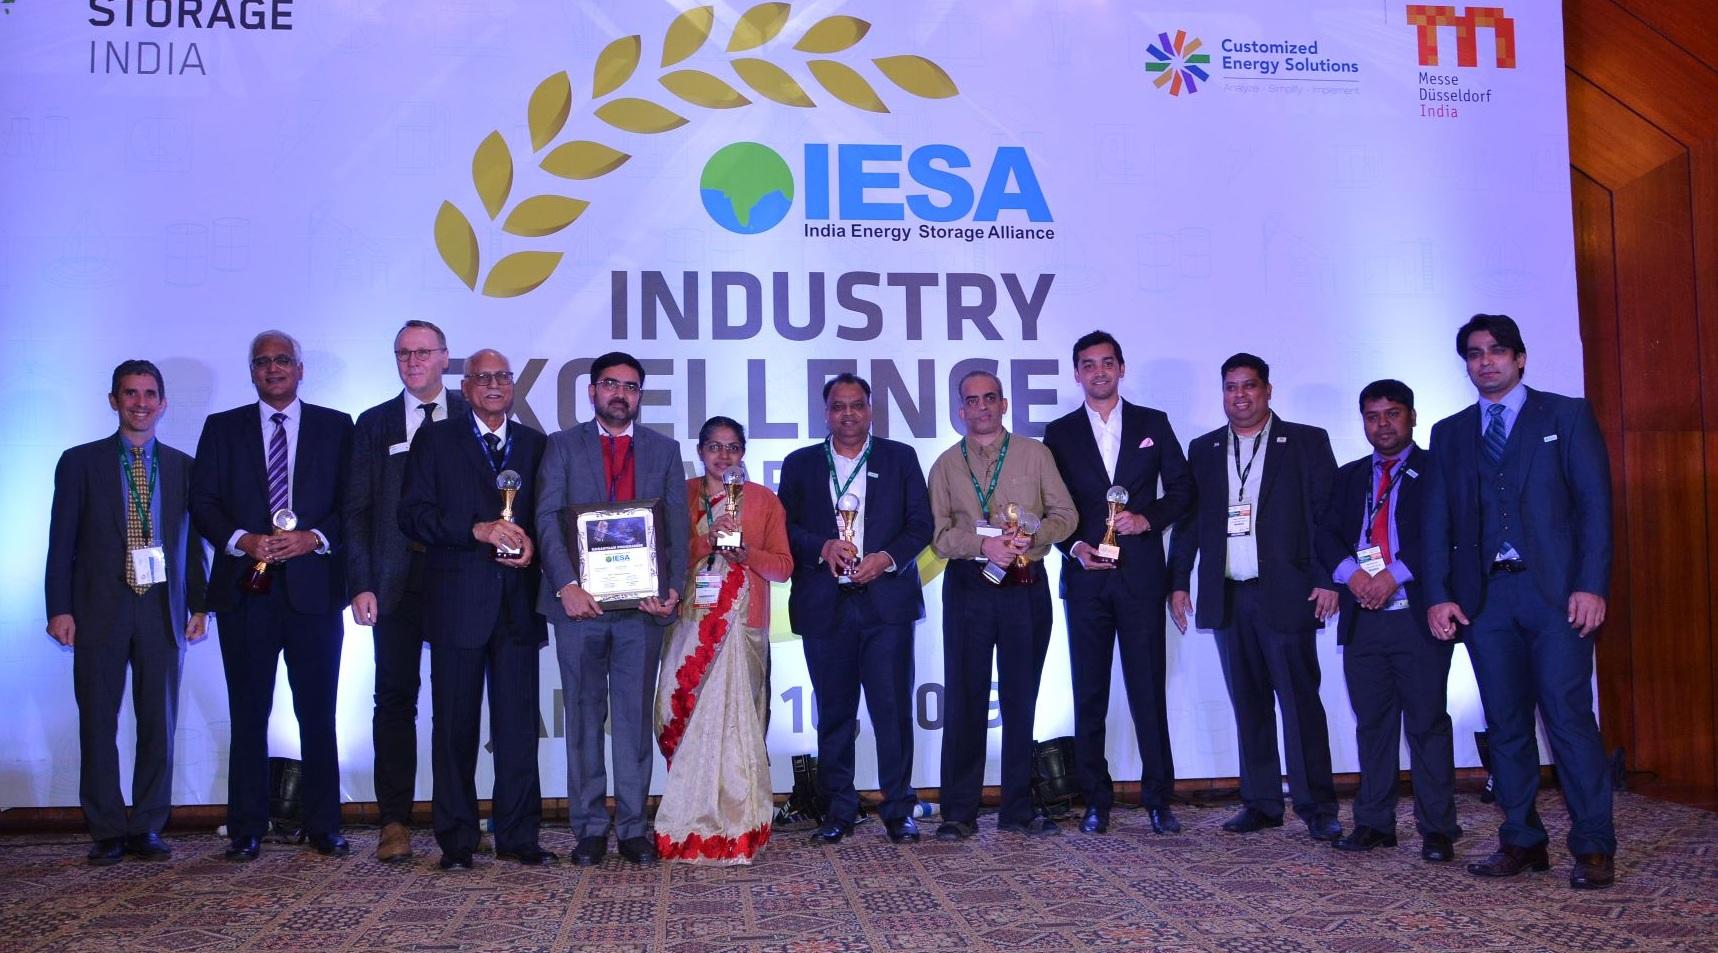 ISRO Bags 'Innovative Company of the Year' Award at IESA